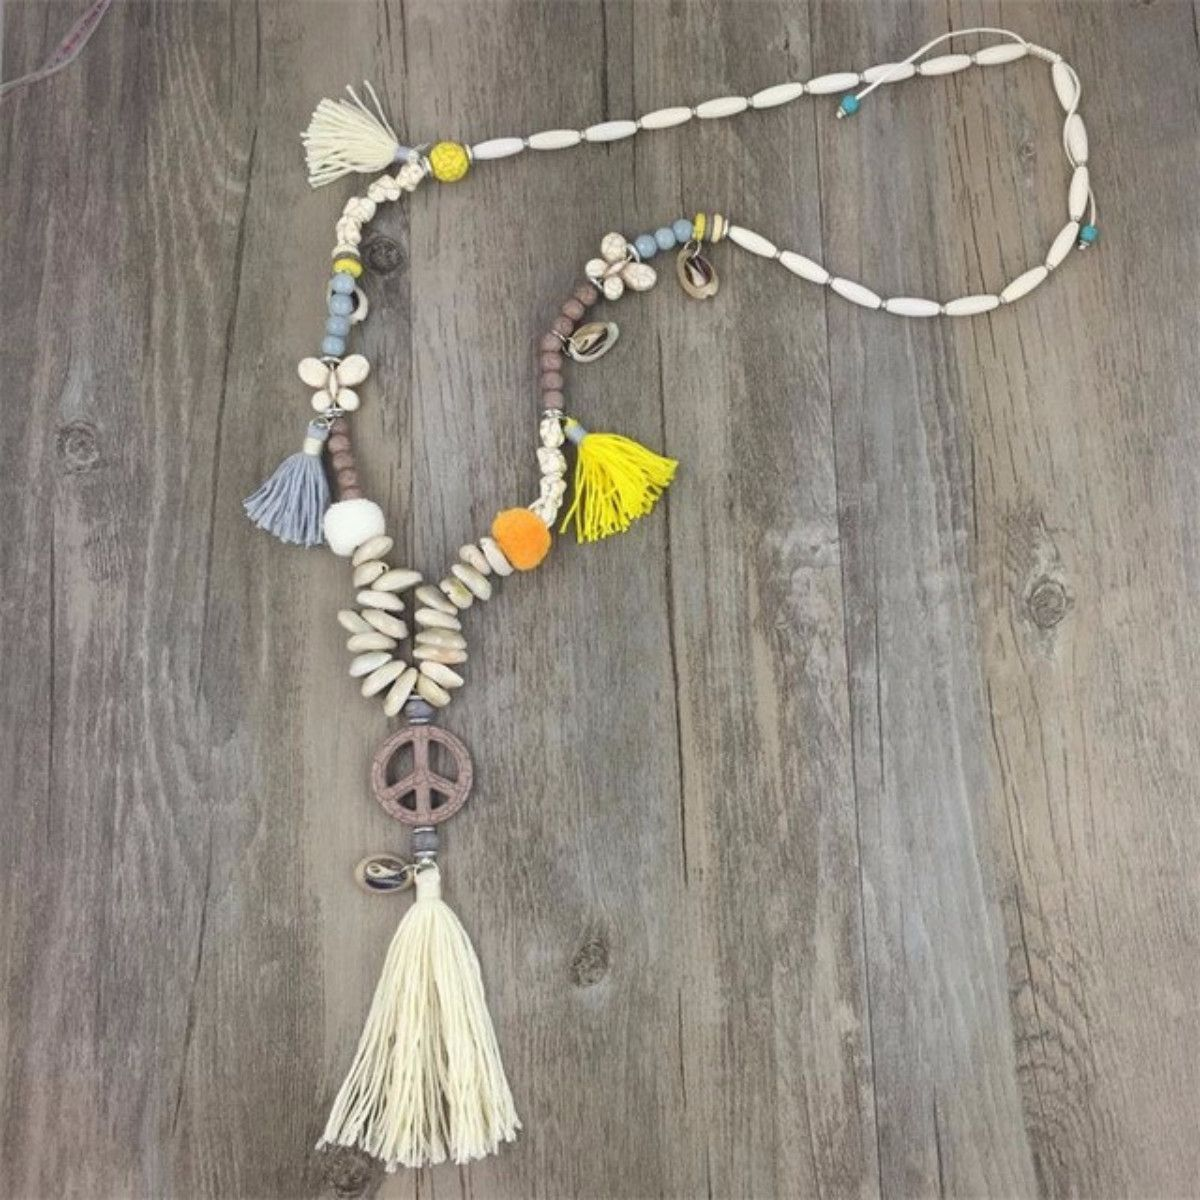 Handmade Peace Necklace